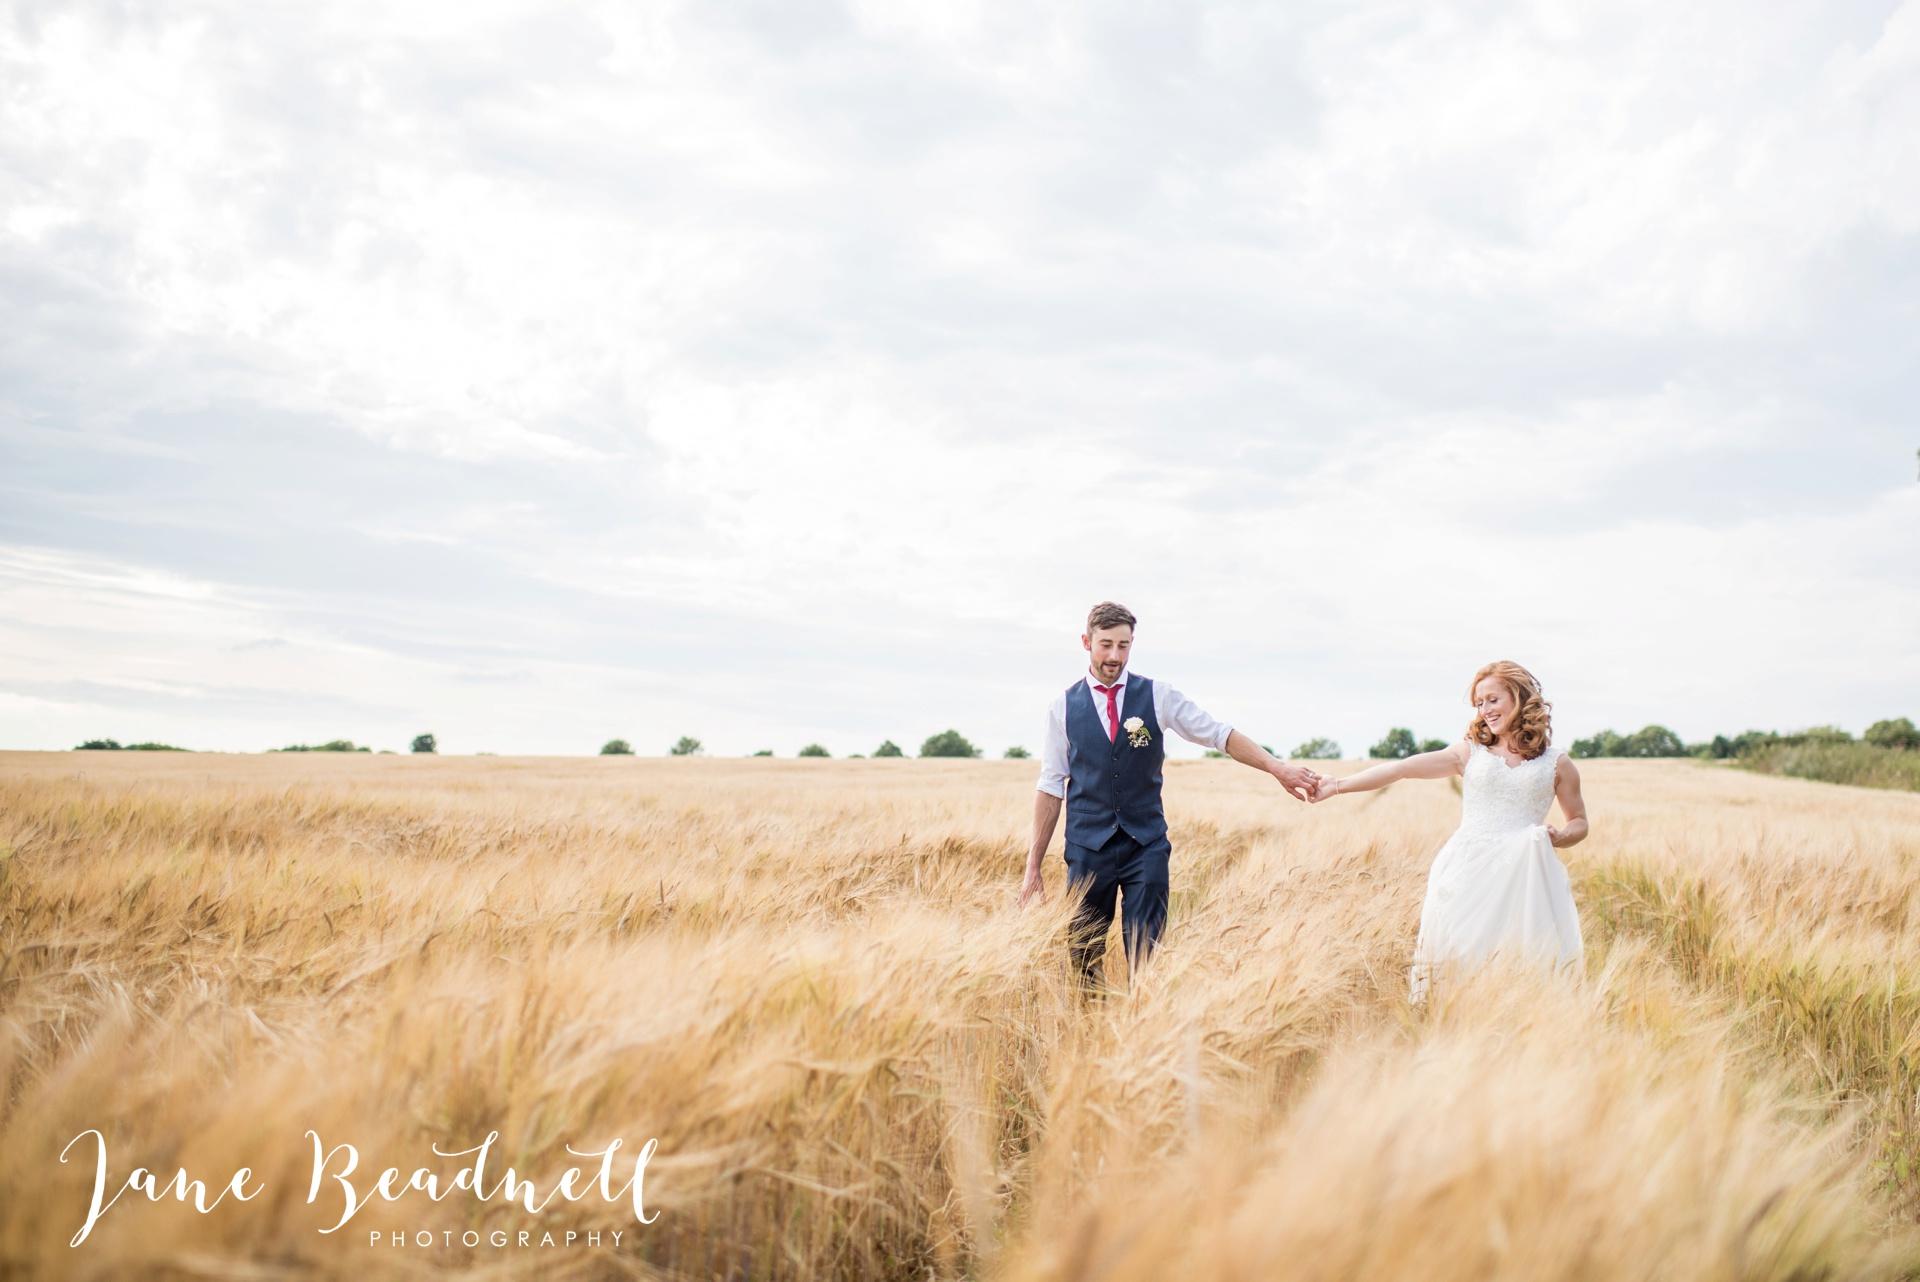 yorkshire-fine-art-wedding-photographer-jane-beadnell-photography-poppleton-york_0143